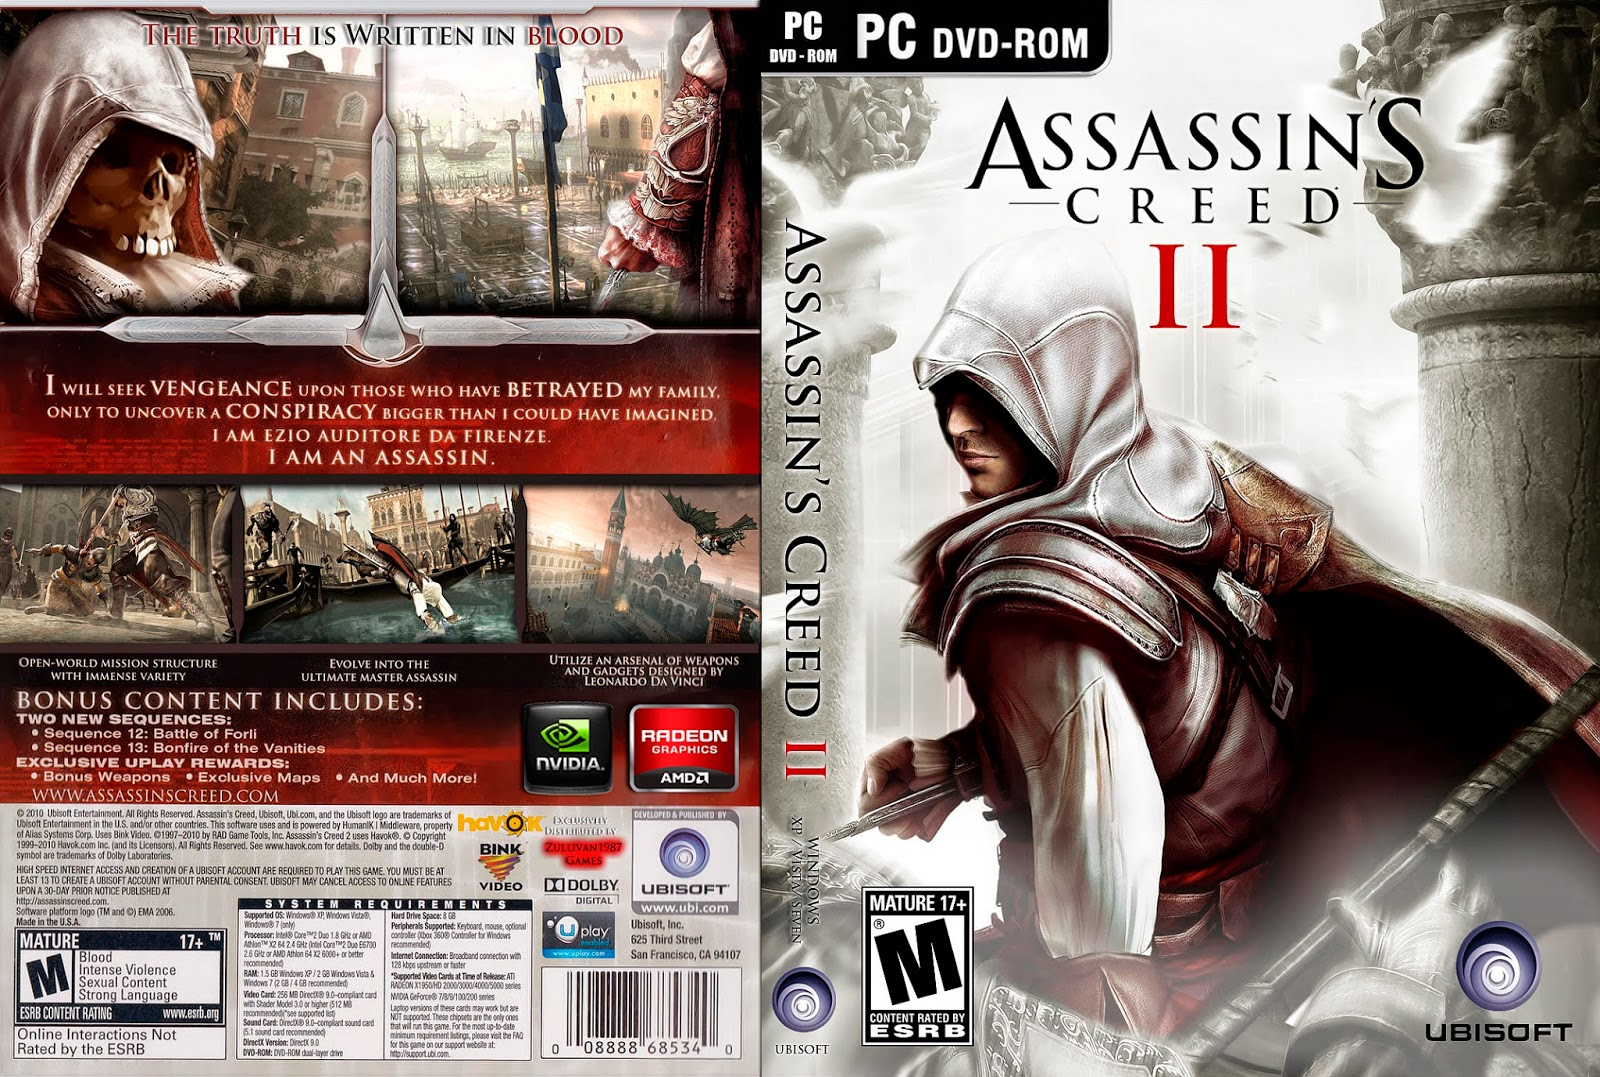 تحميل لعبة Assassins Creed 2 برابط واحد مباشر